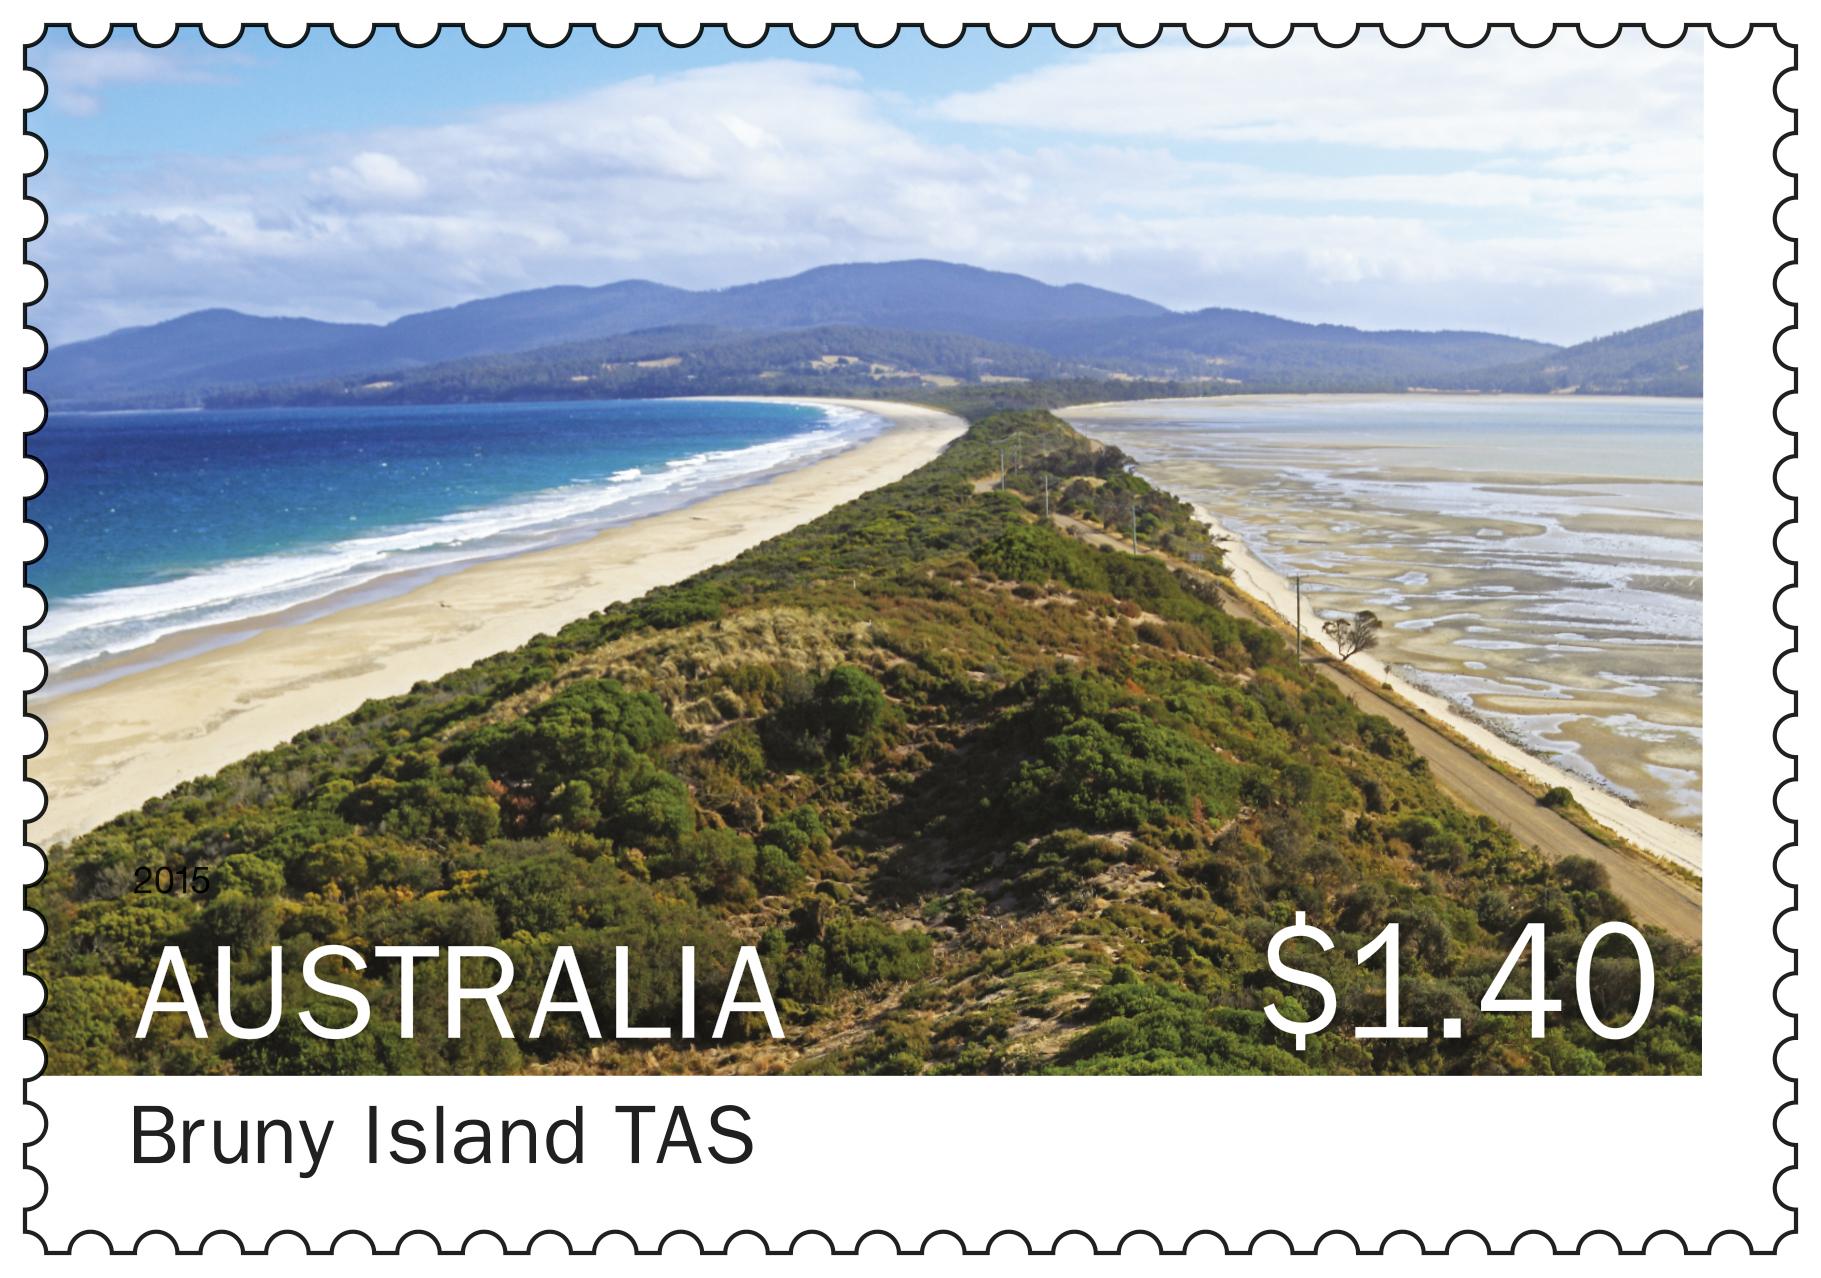 Bruny Island Tasmania stamp